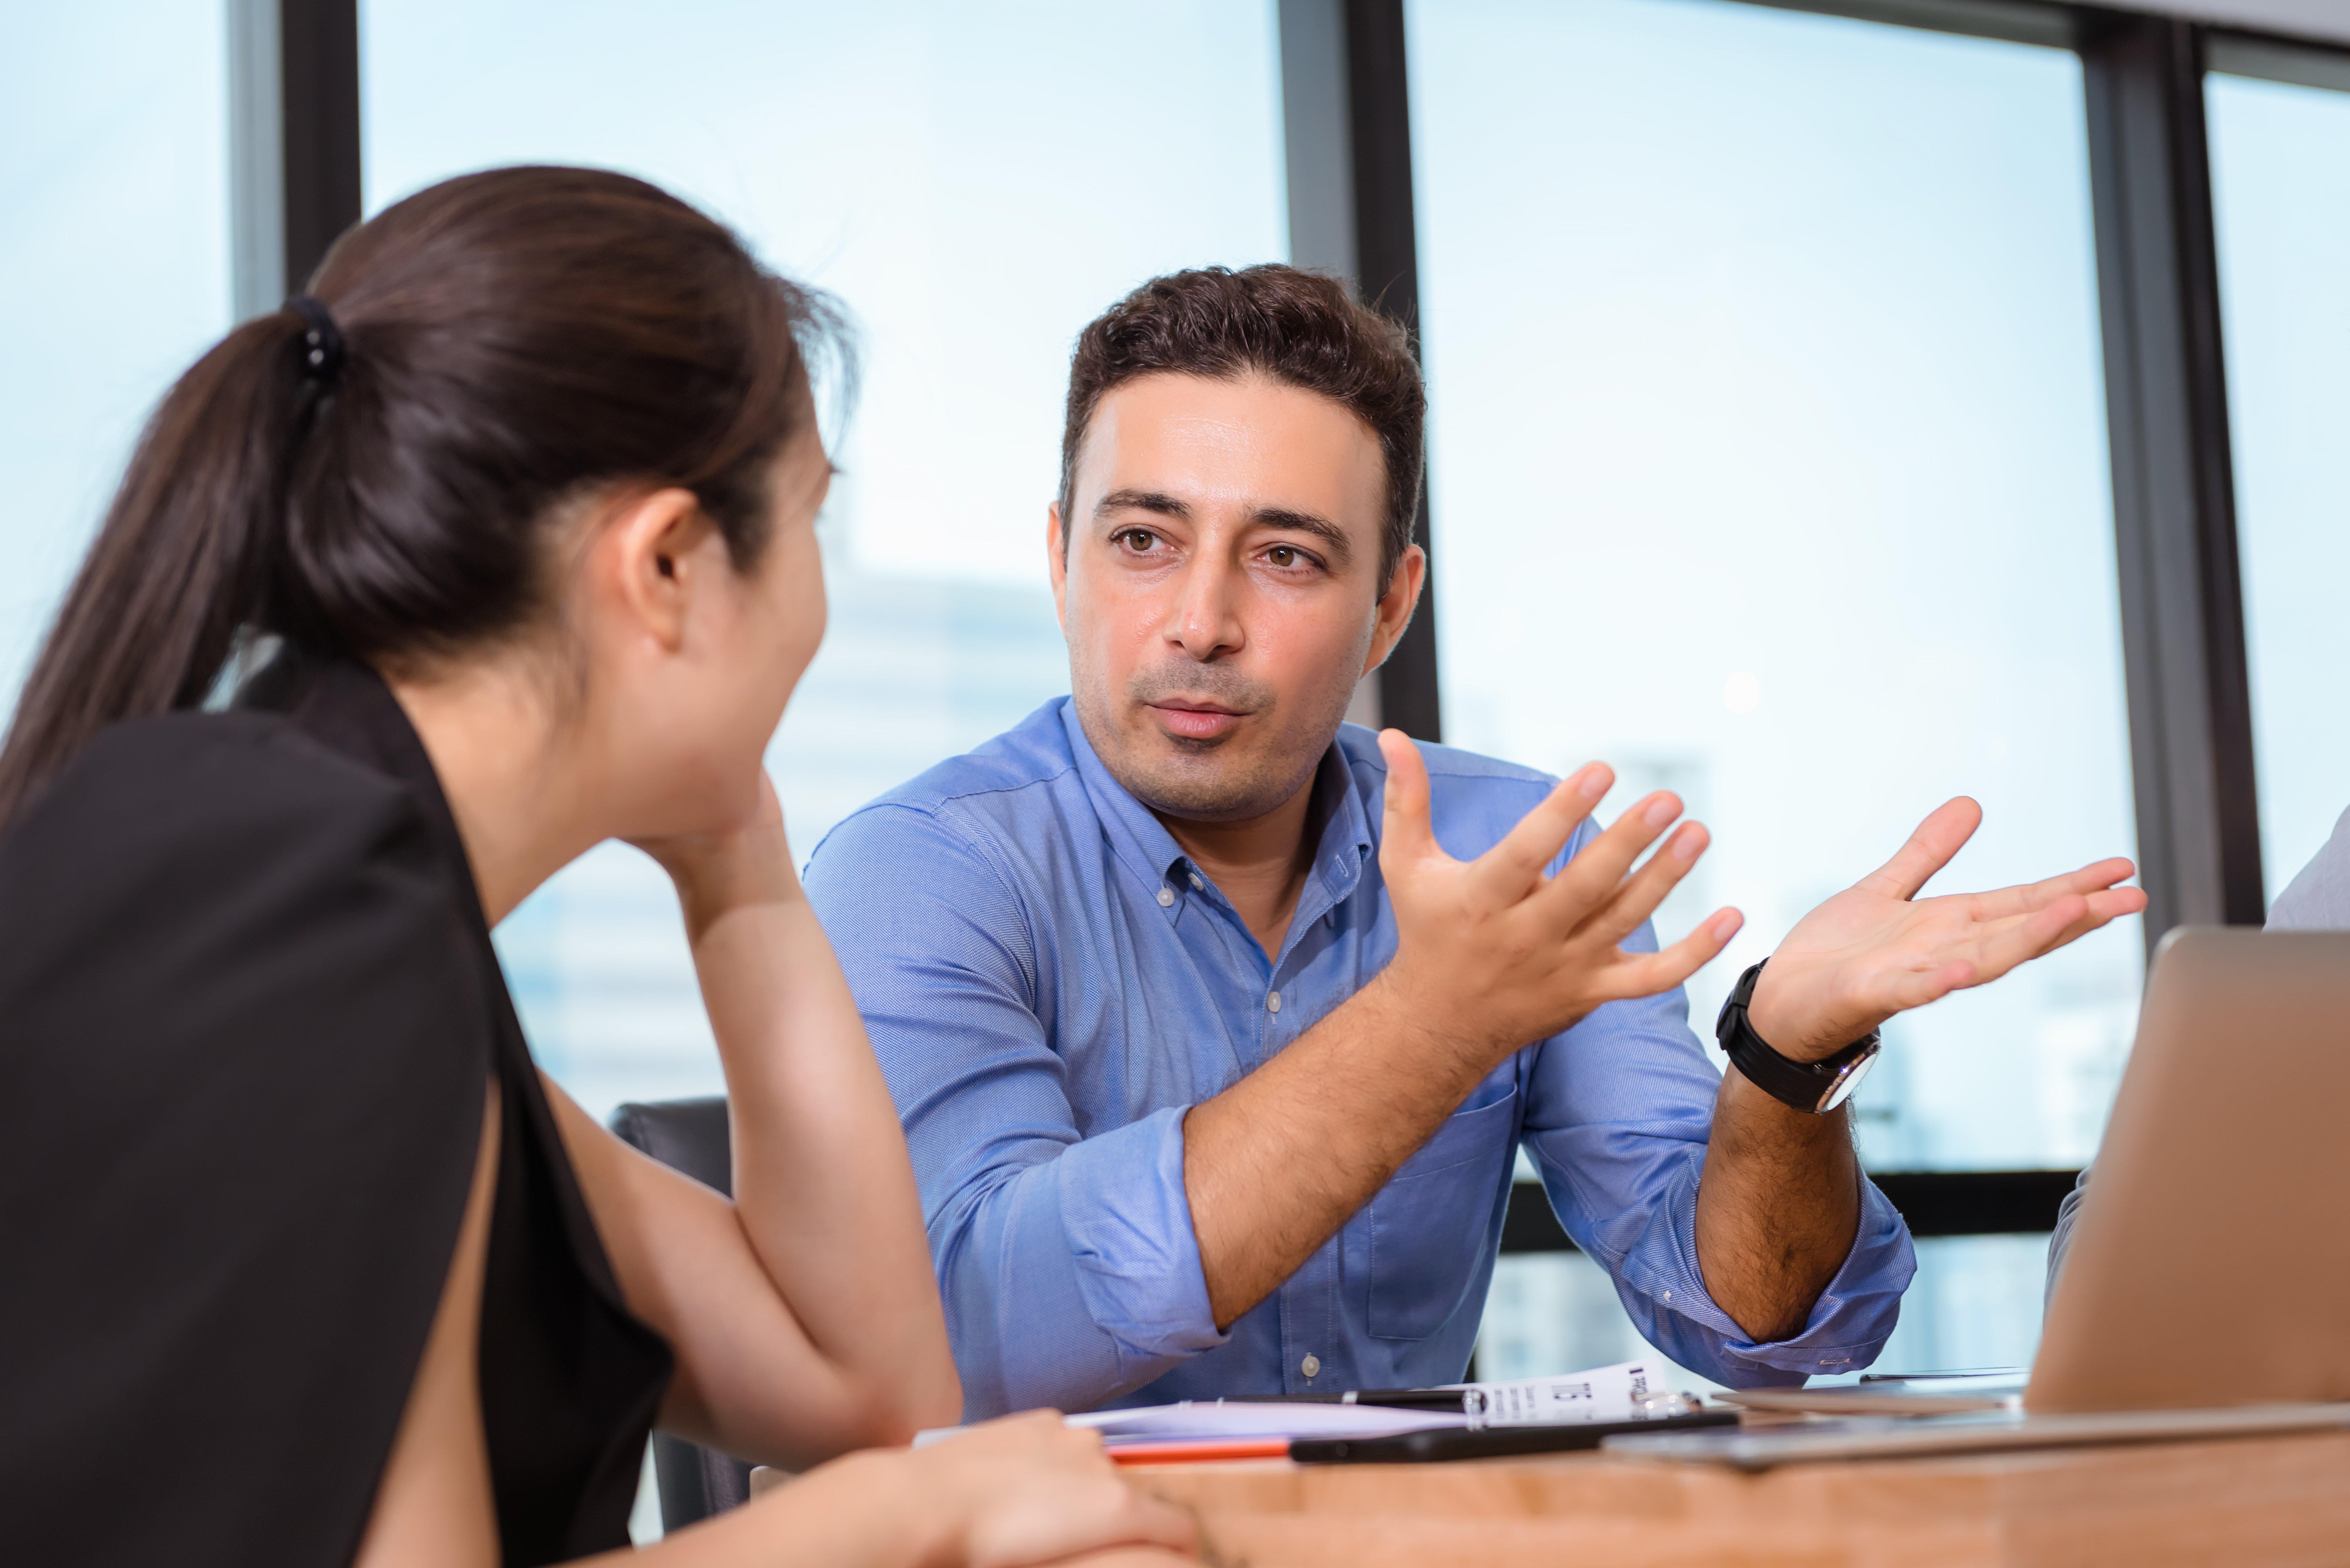 bigstock-Business-People-Are-Meeting-Di-297520495